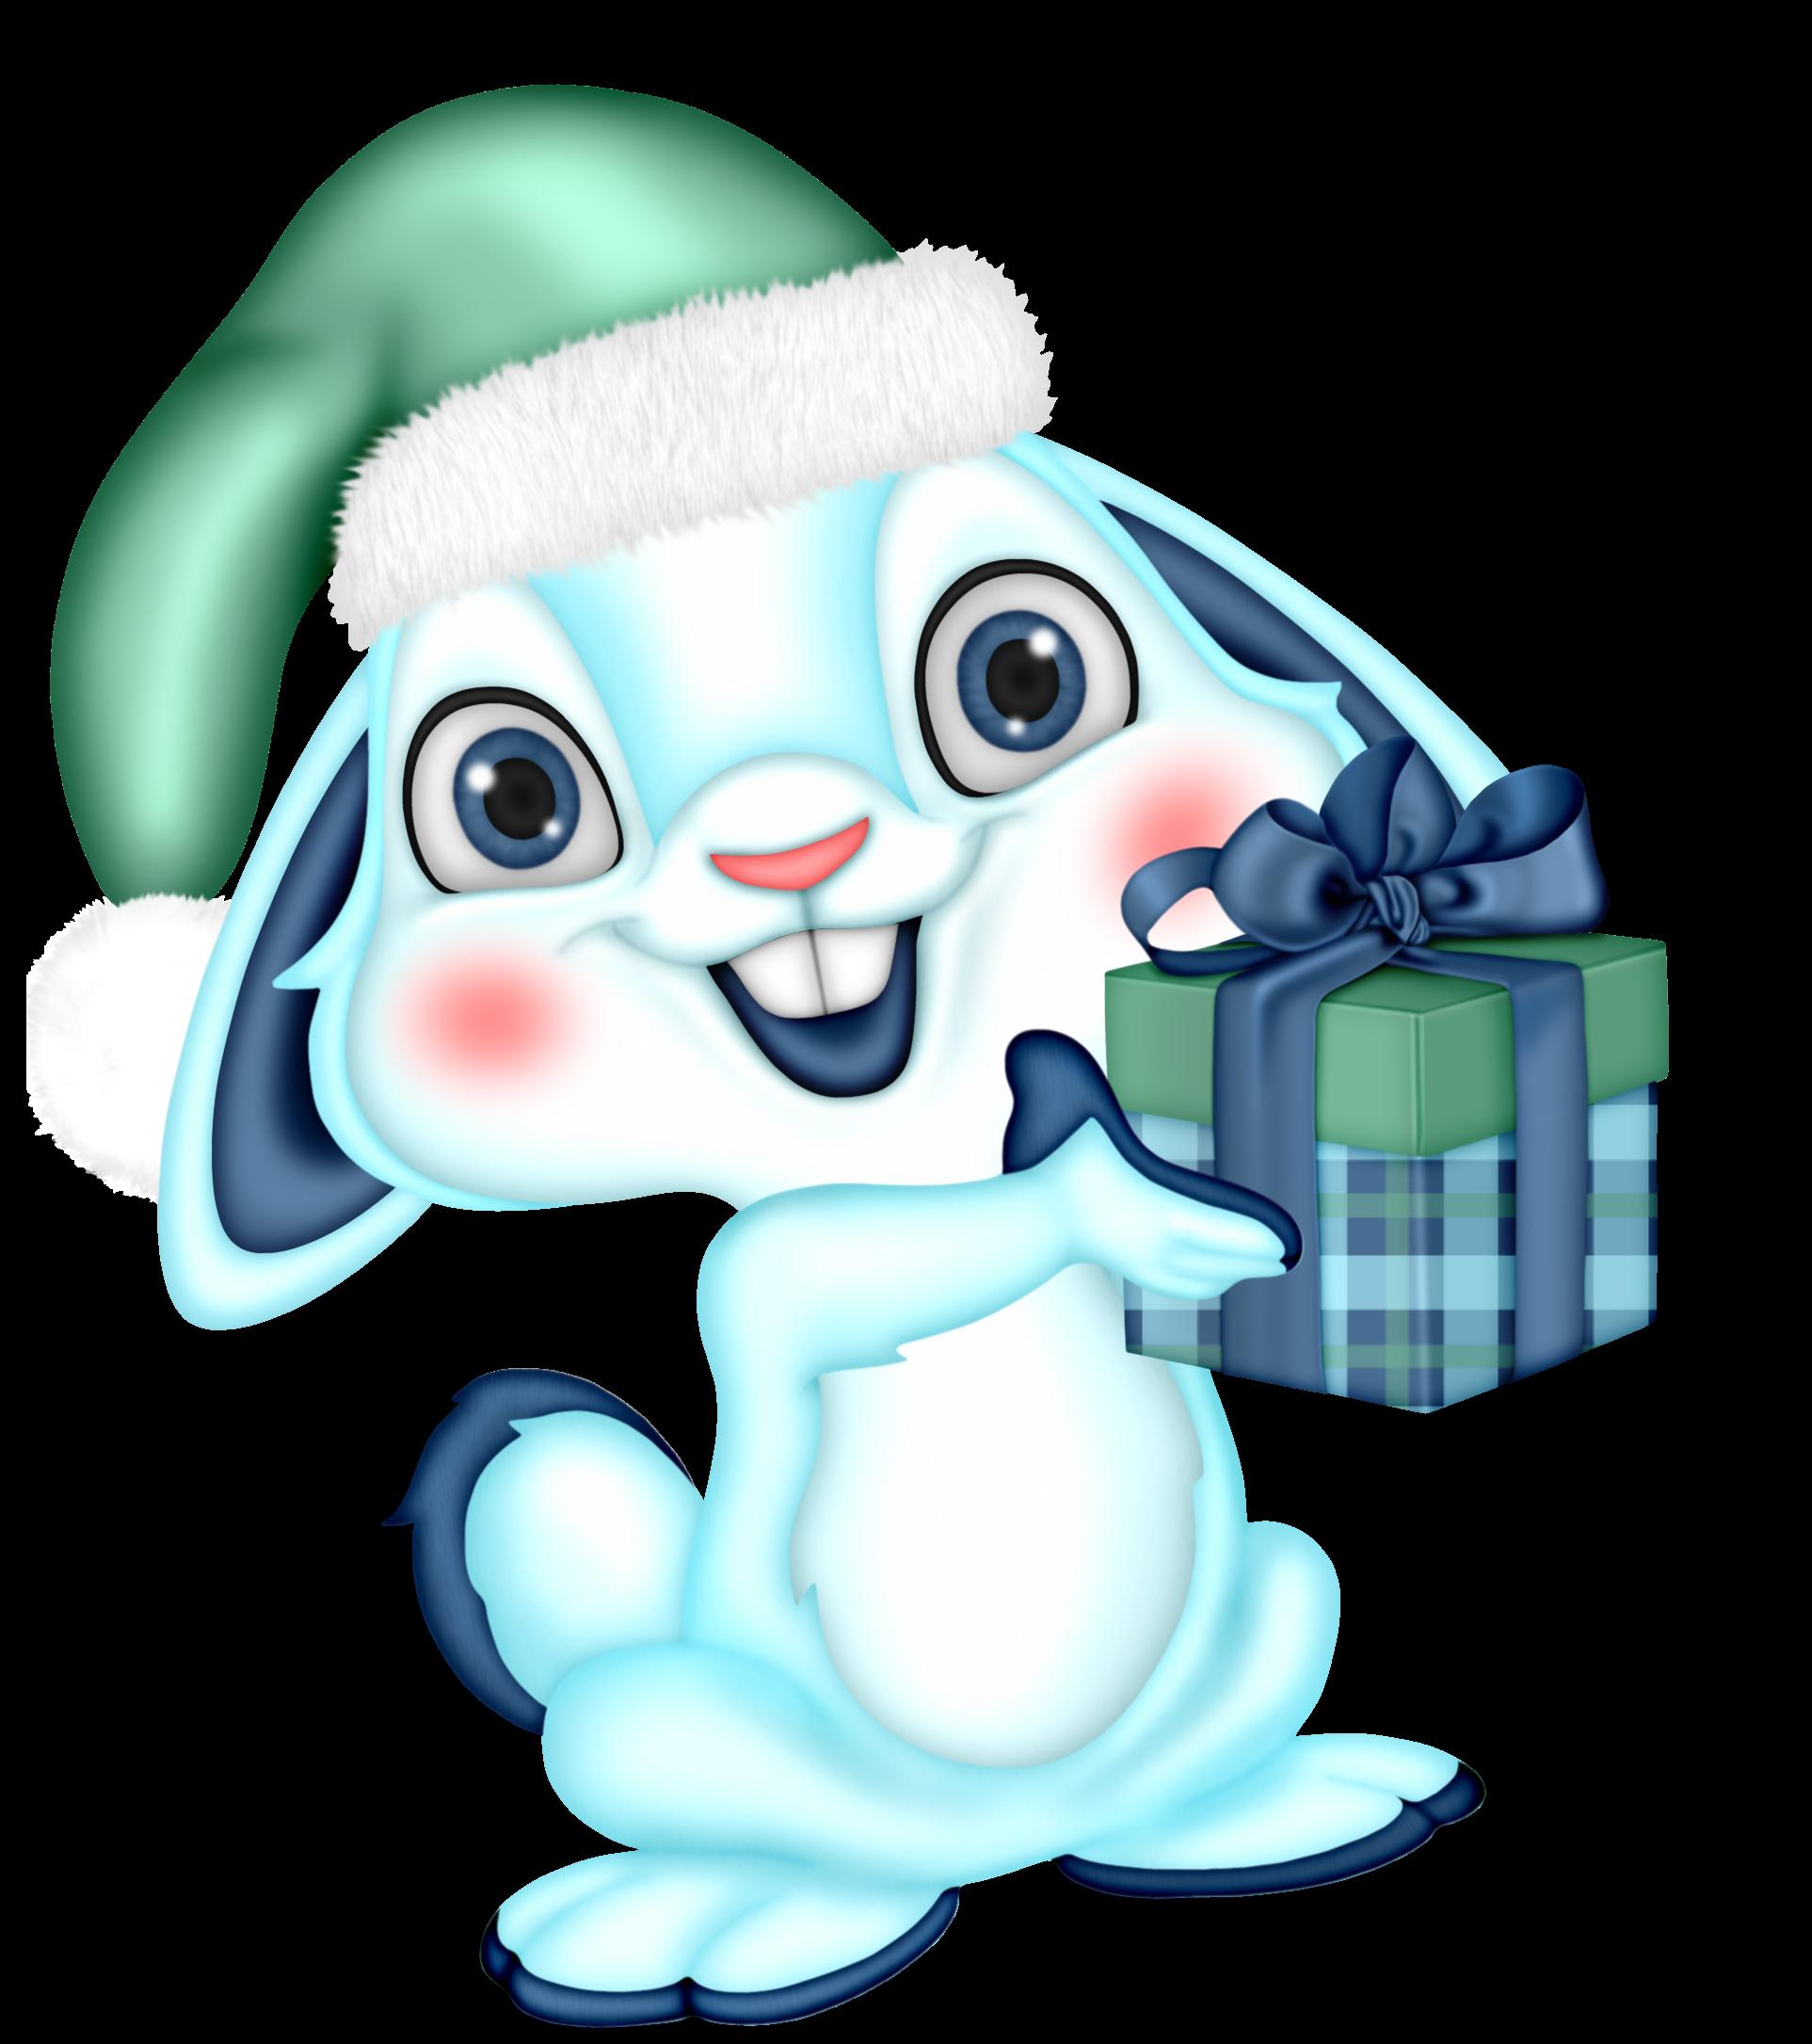 Conejito Azúl De Navidad E8z6